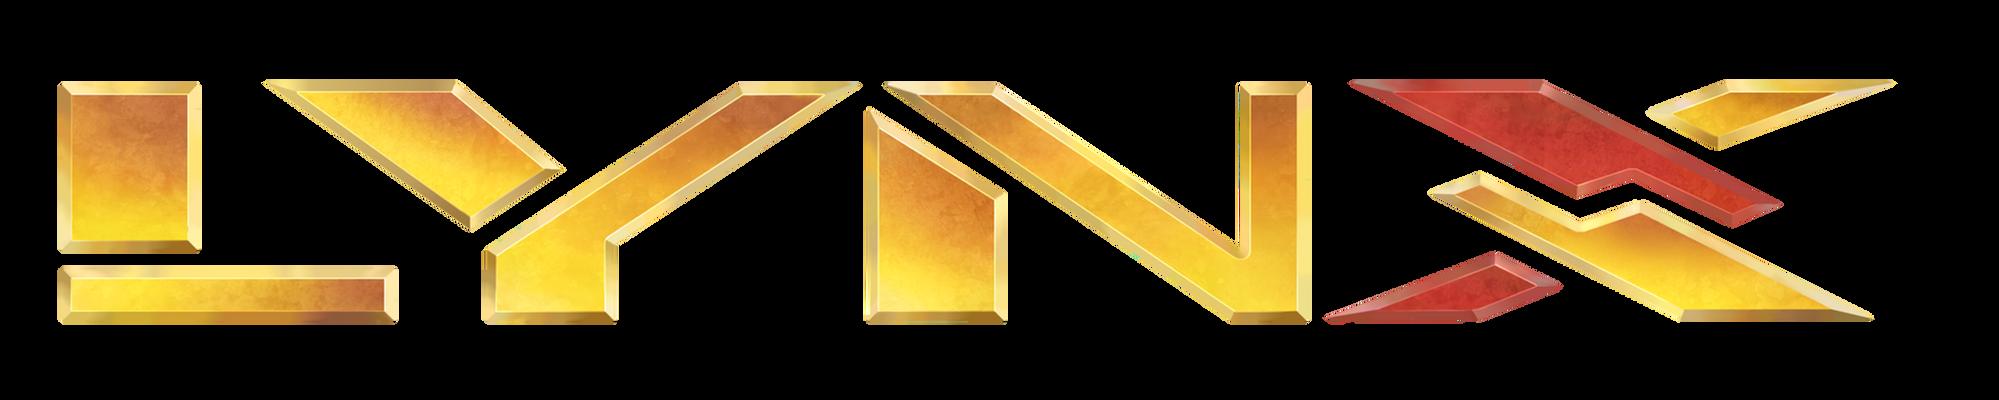 Atari Lynx re-created logo  by Anarkhya